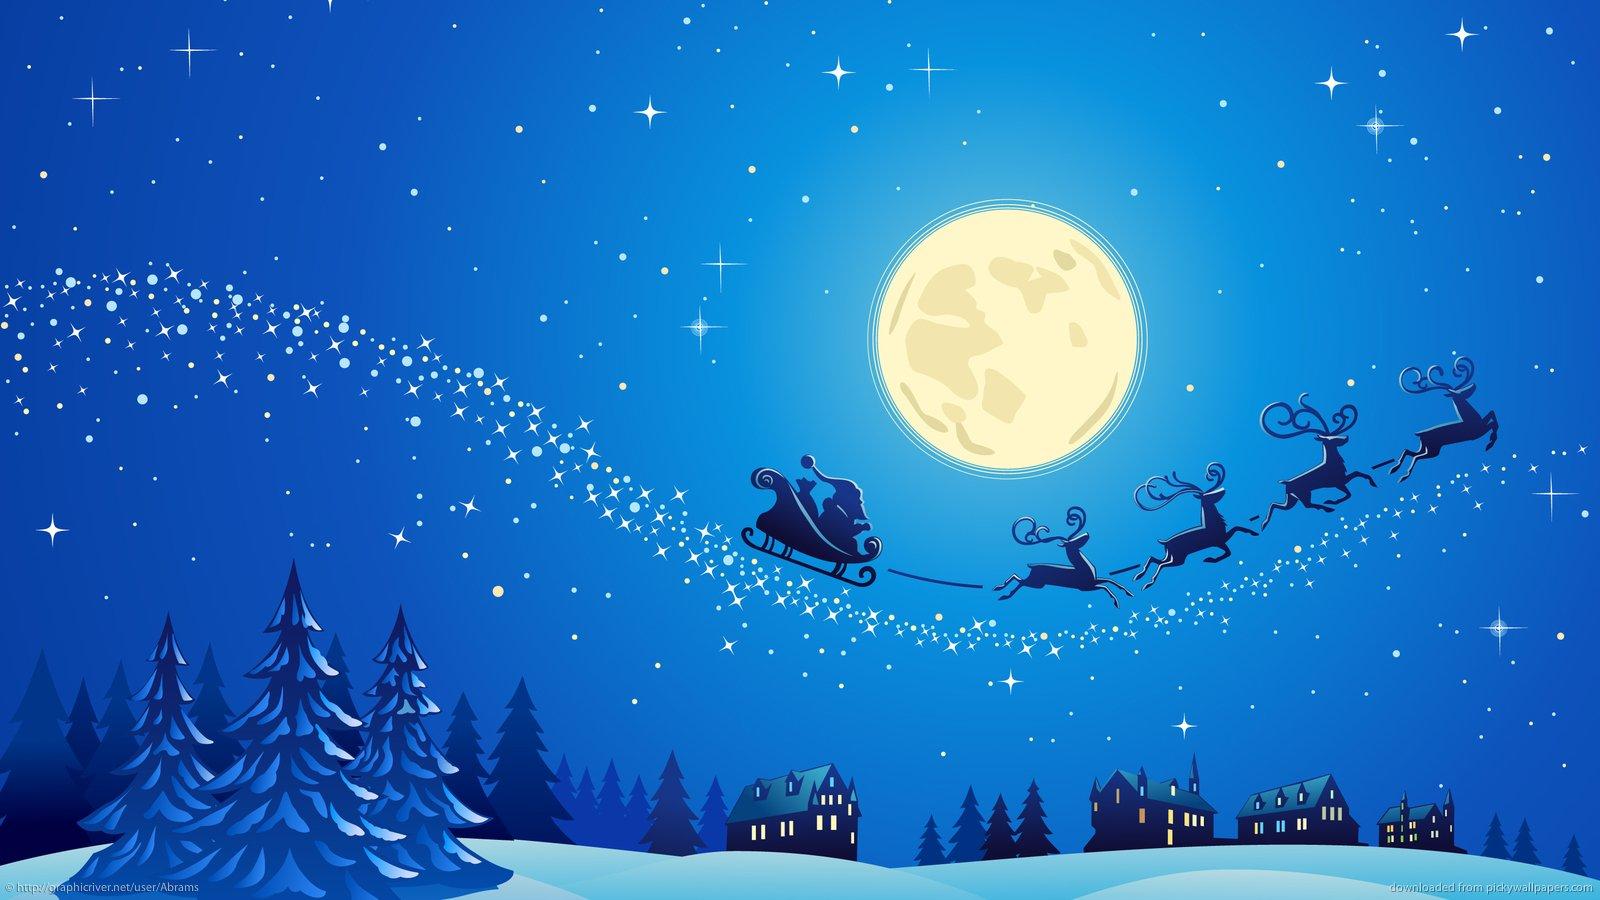 Download 1600x900 Santa Into The Winter Christmas Night 2 Wallpaper 1600x900